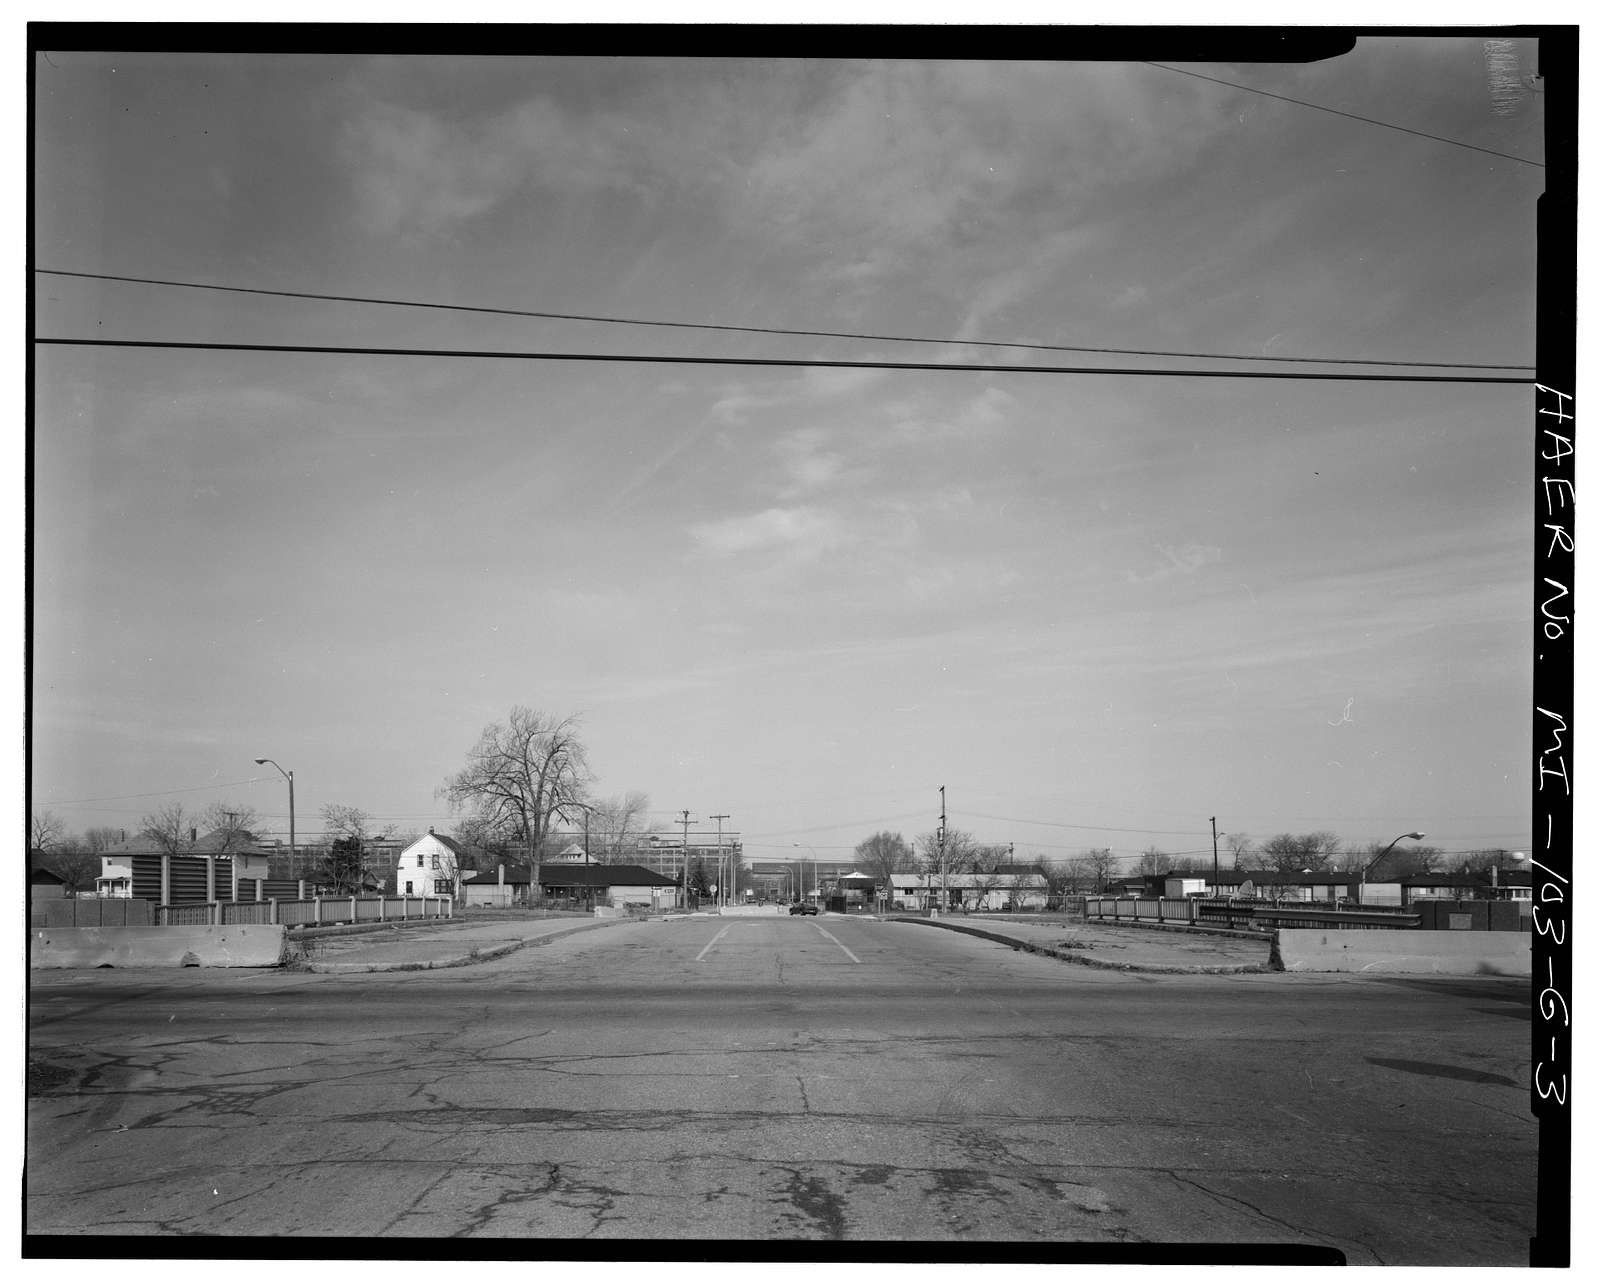 Davison Freeway, Brush Street Avenue Bridge, Spanning Davison Freeway, Highland Park, Wayne County, MI